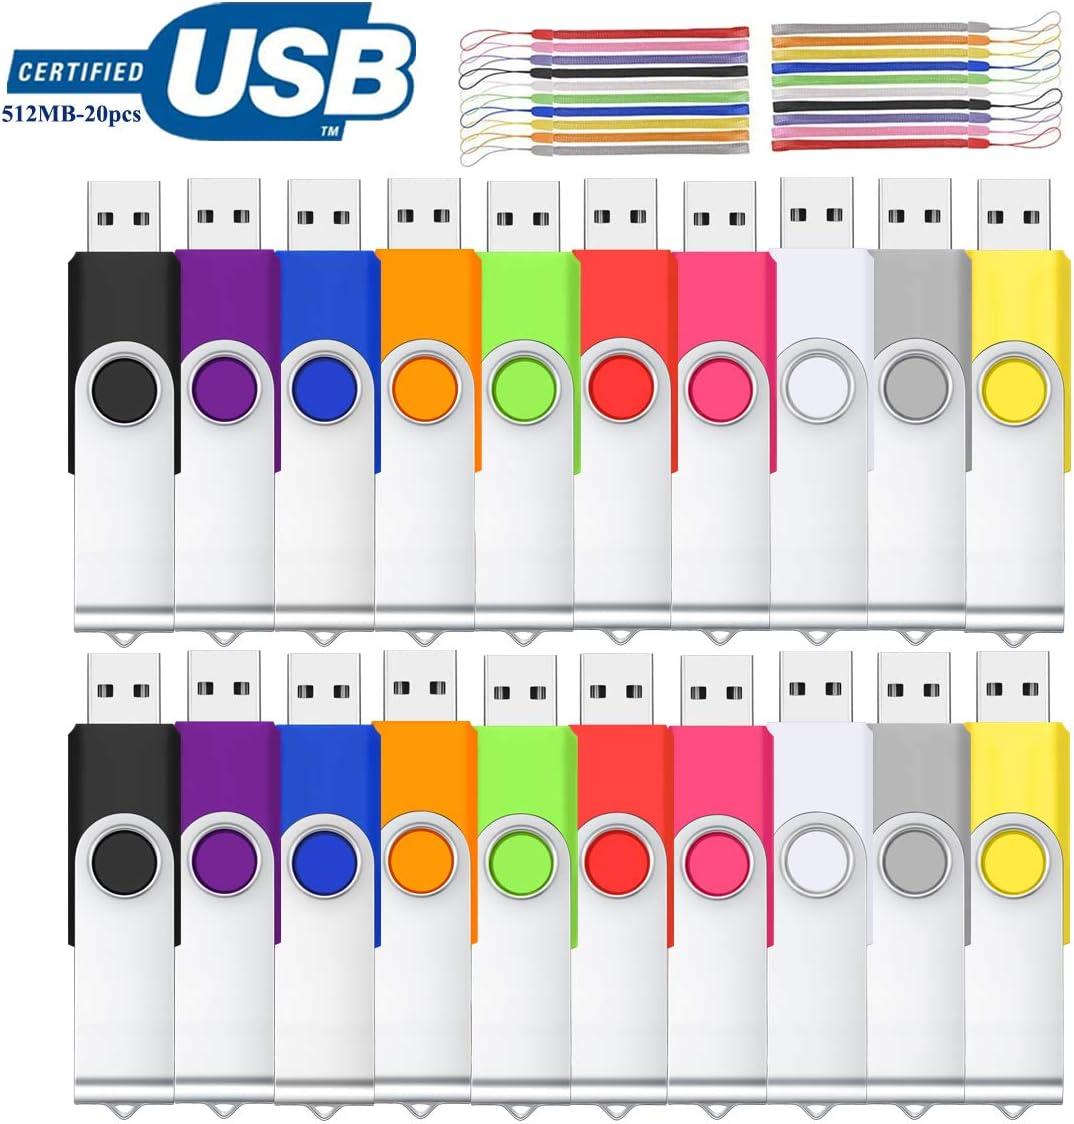 Viewfun 512M 20 Piezas Memoria USB Pendrive USB 2.0 Giratoria 360° para Almacenamiento Datos con Cordones (512M, Multicolor*20)